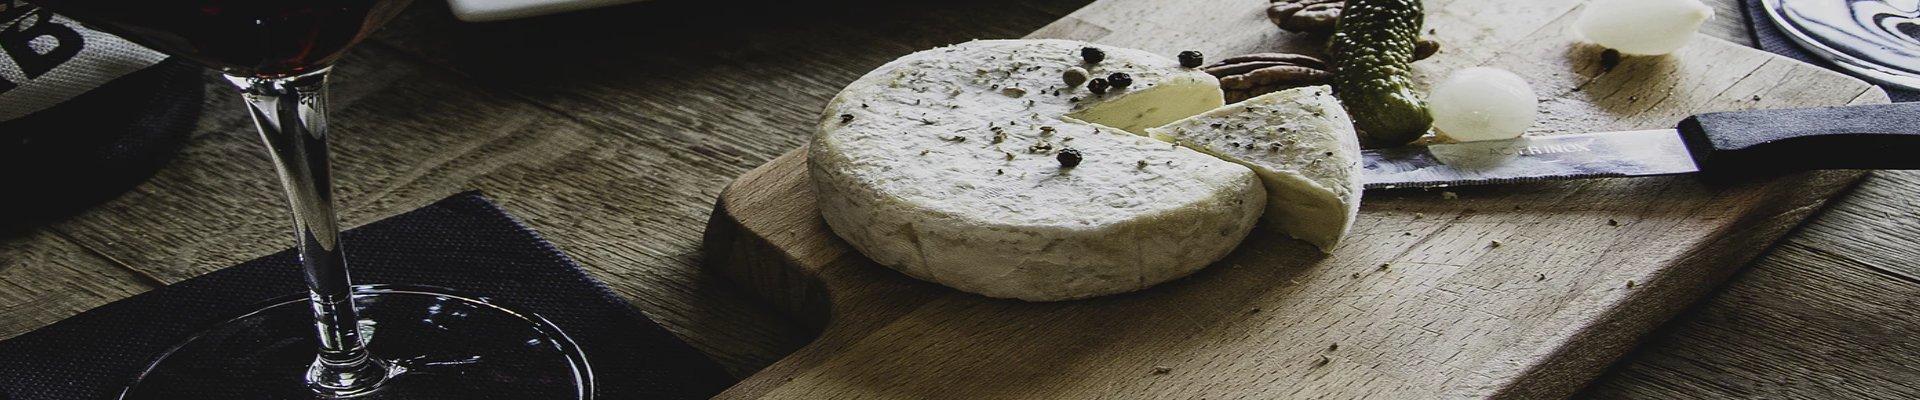 formaggio in cucina